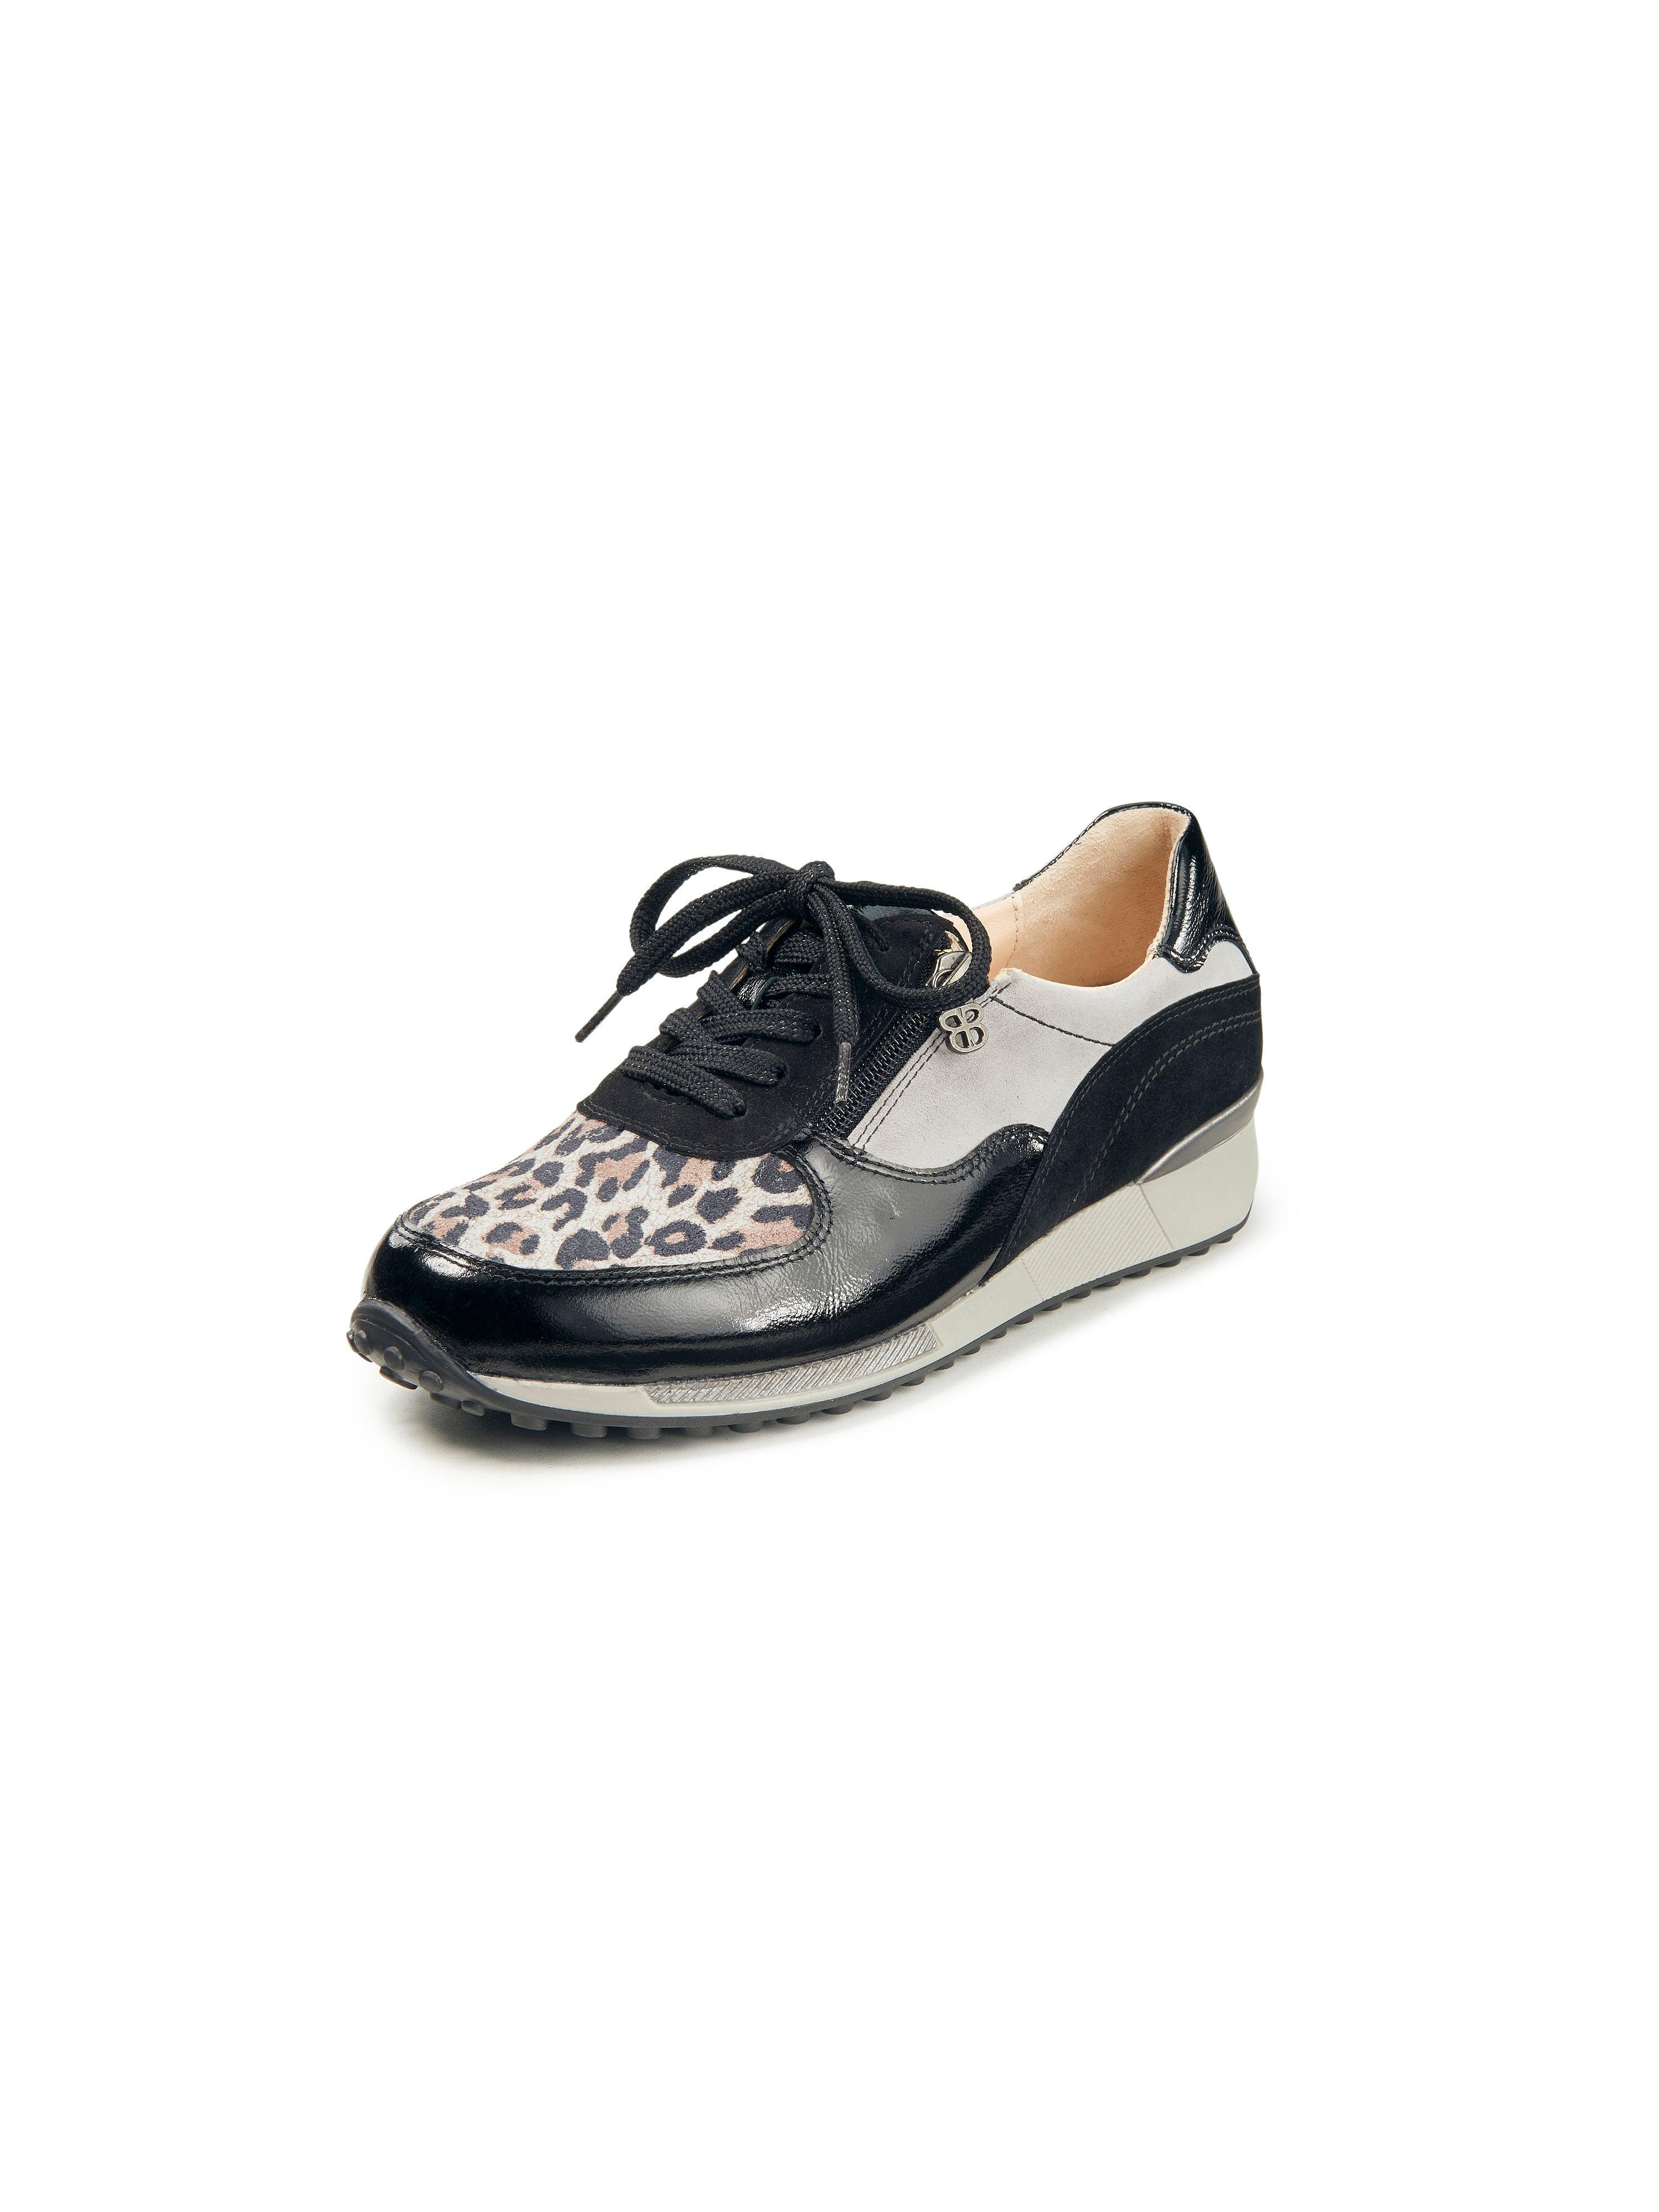 Sneakers Jule Van Basler zwart